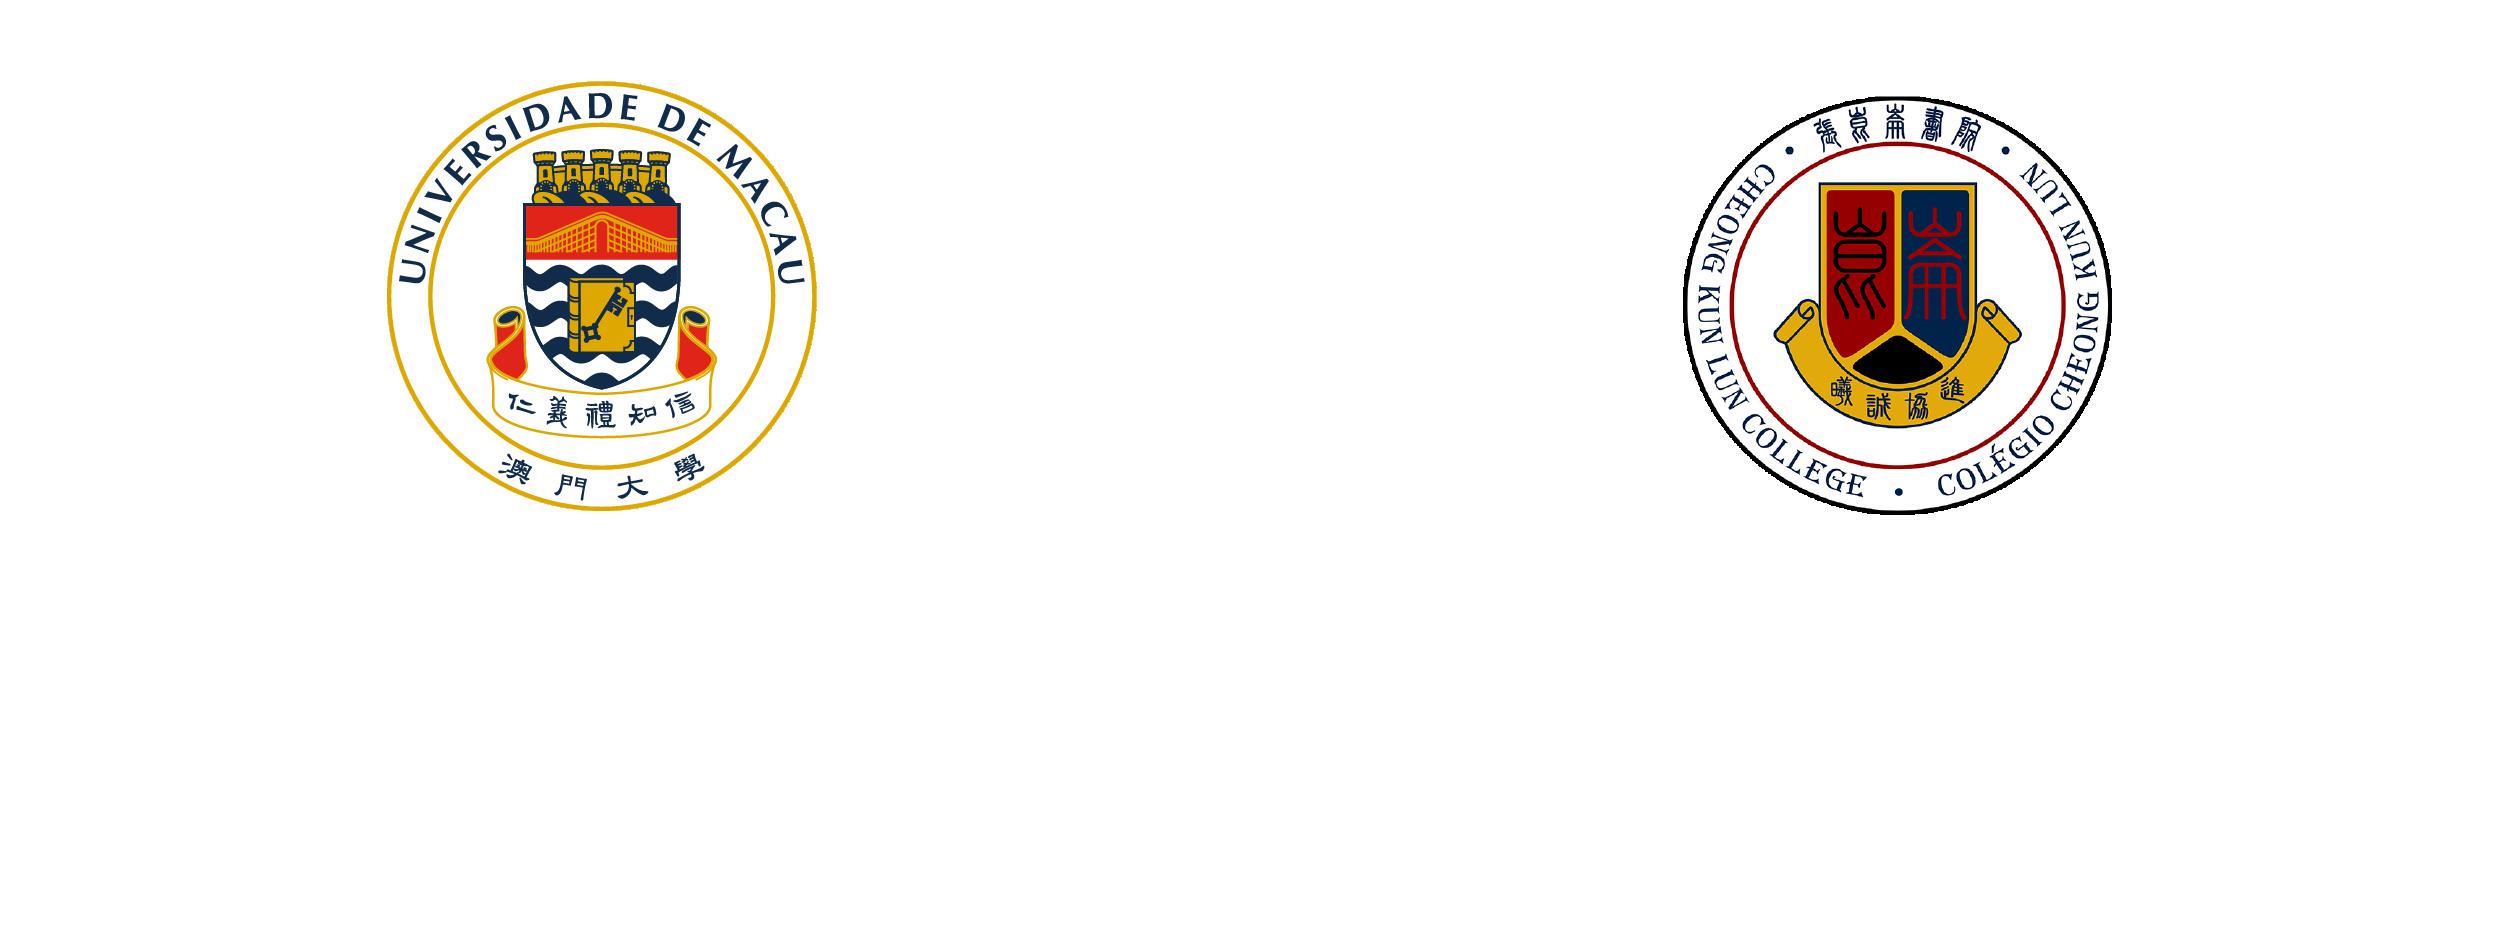 Cheong Kun Lun College | University of Macau Logo